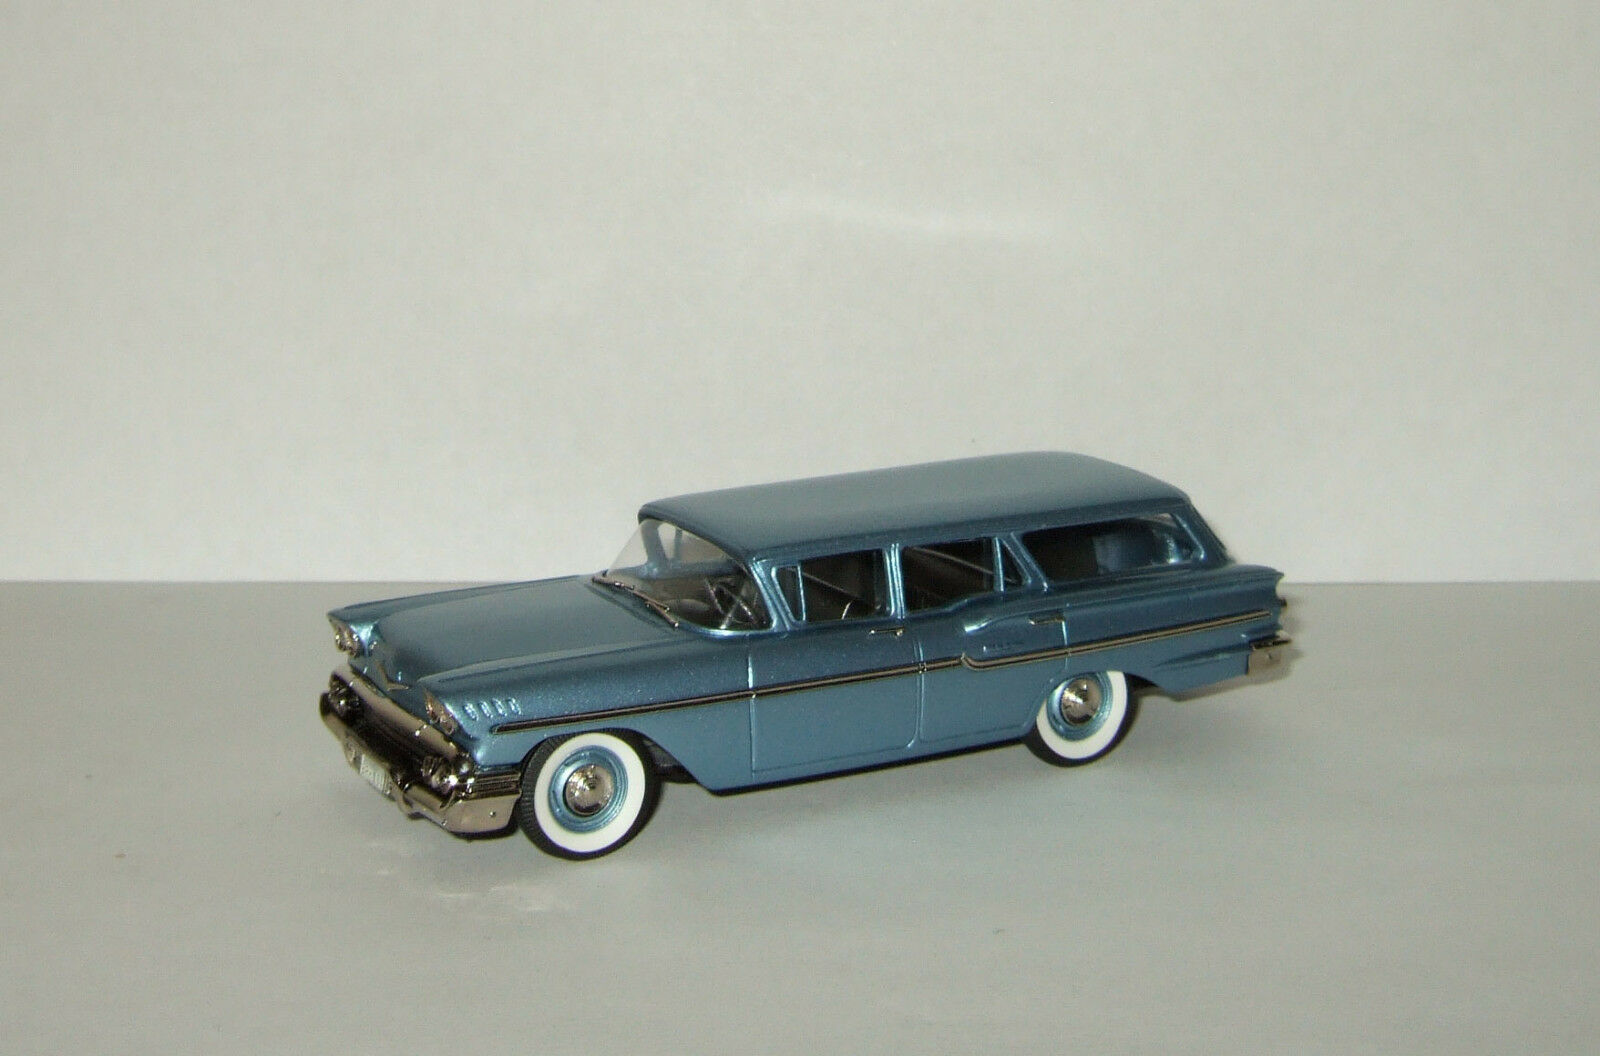 vendita online 1 43 BROOKLIN modelloS CHEVROLET Yeouomo STATION WAGON 1958 1958 1958  incredibili sconti